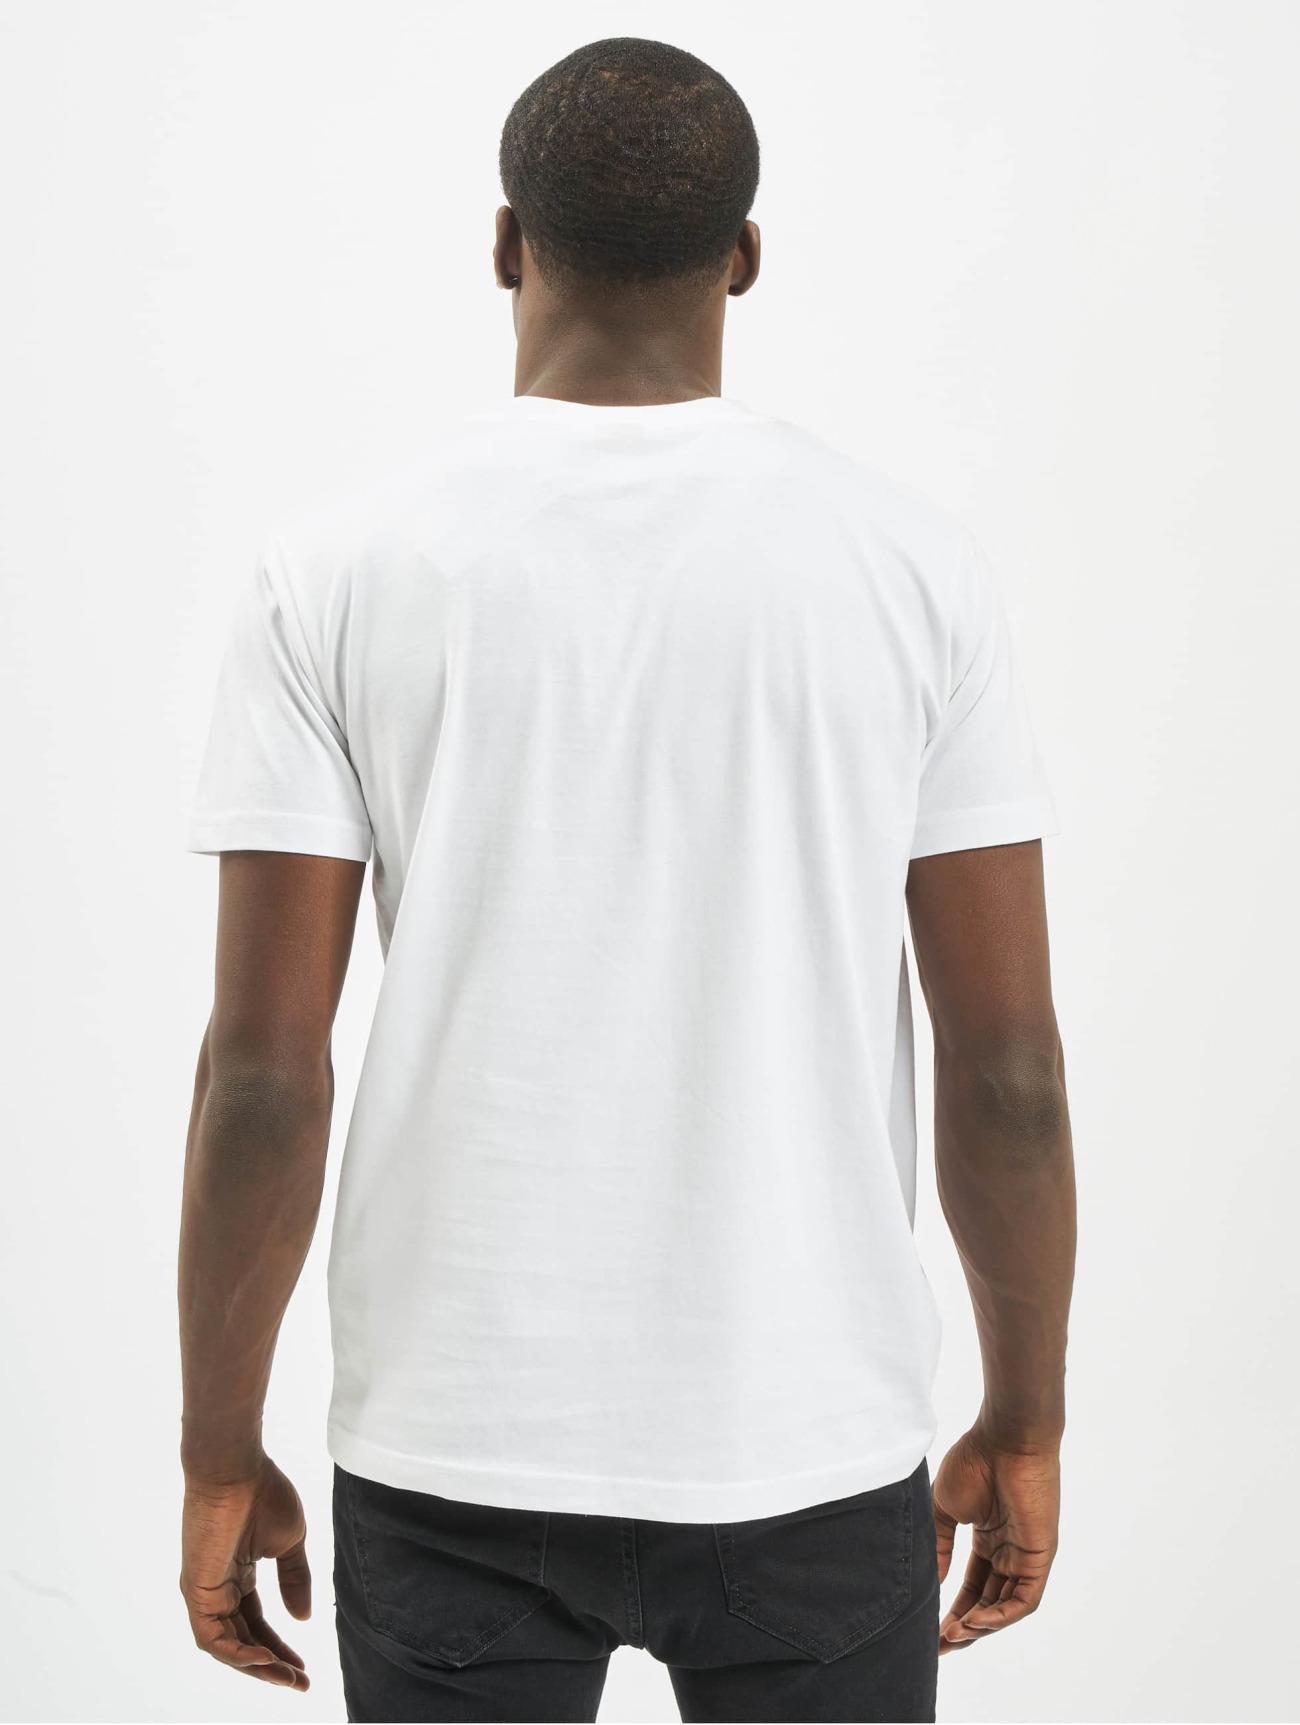 Mister Tee Herren T-Shirt Cash Money Records in weiß 708414